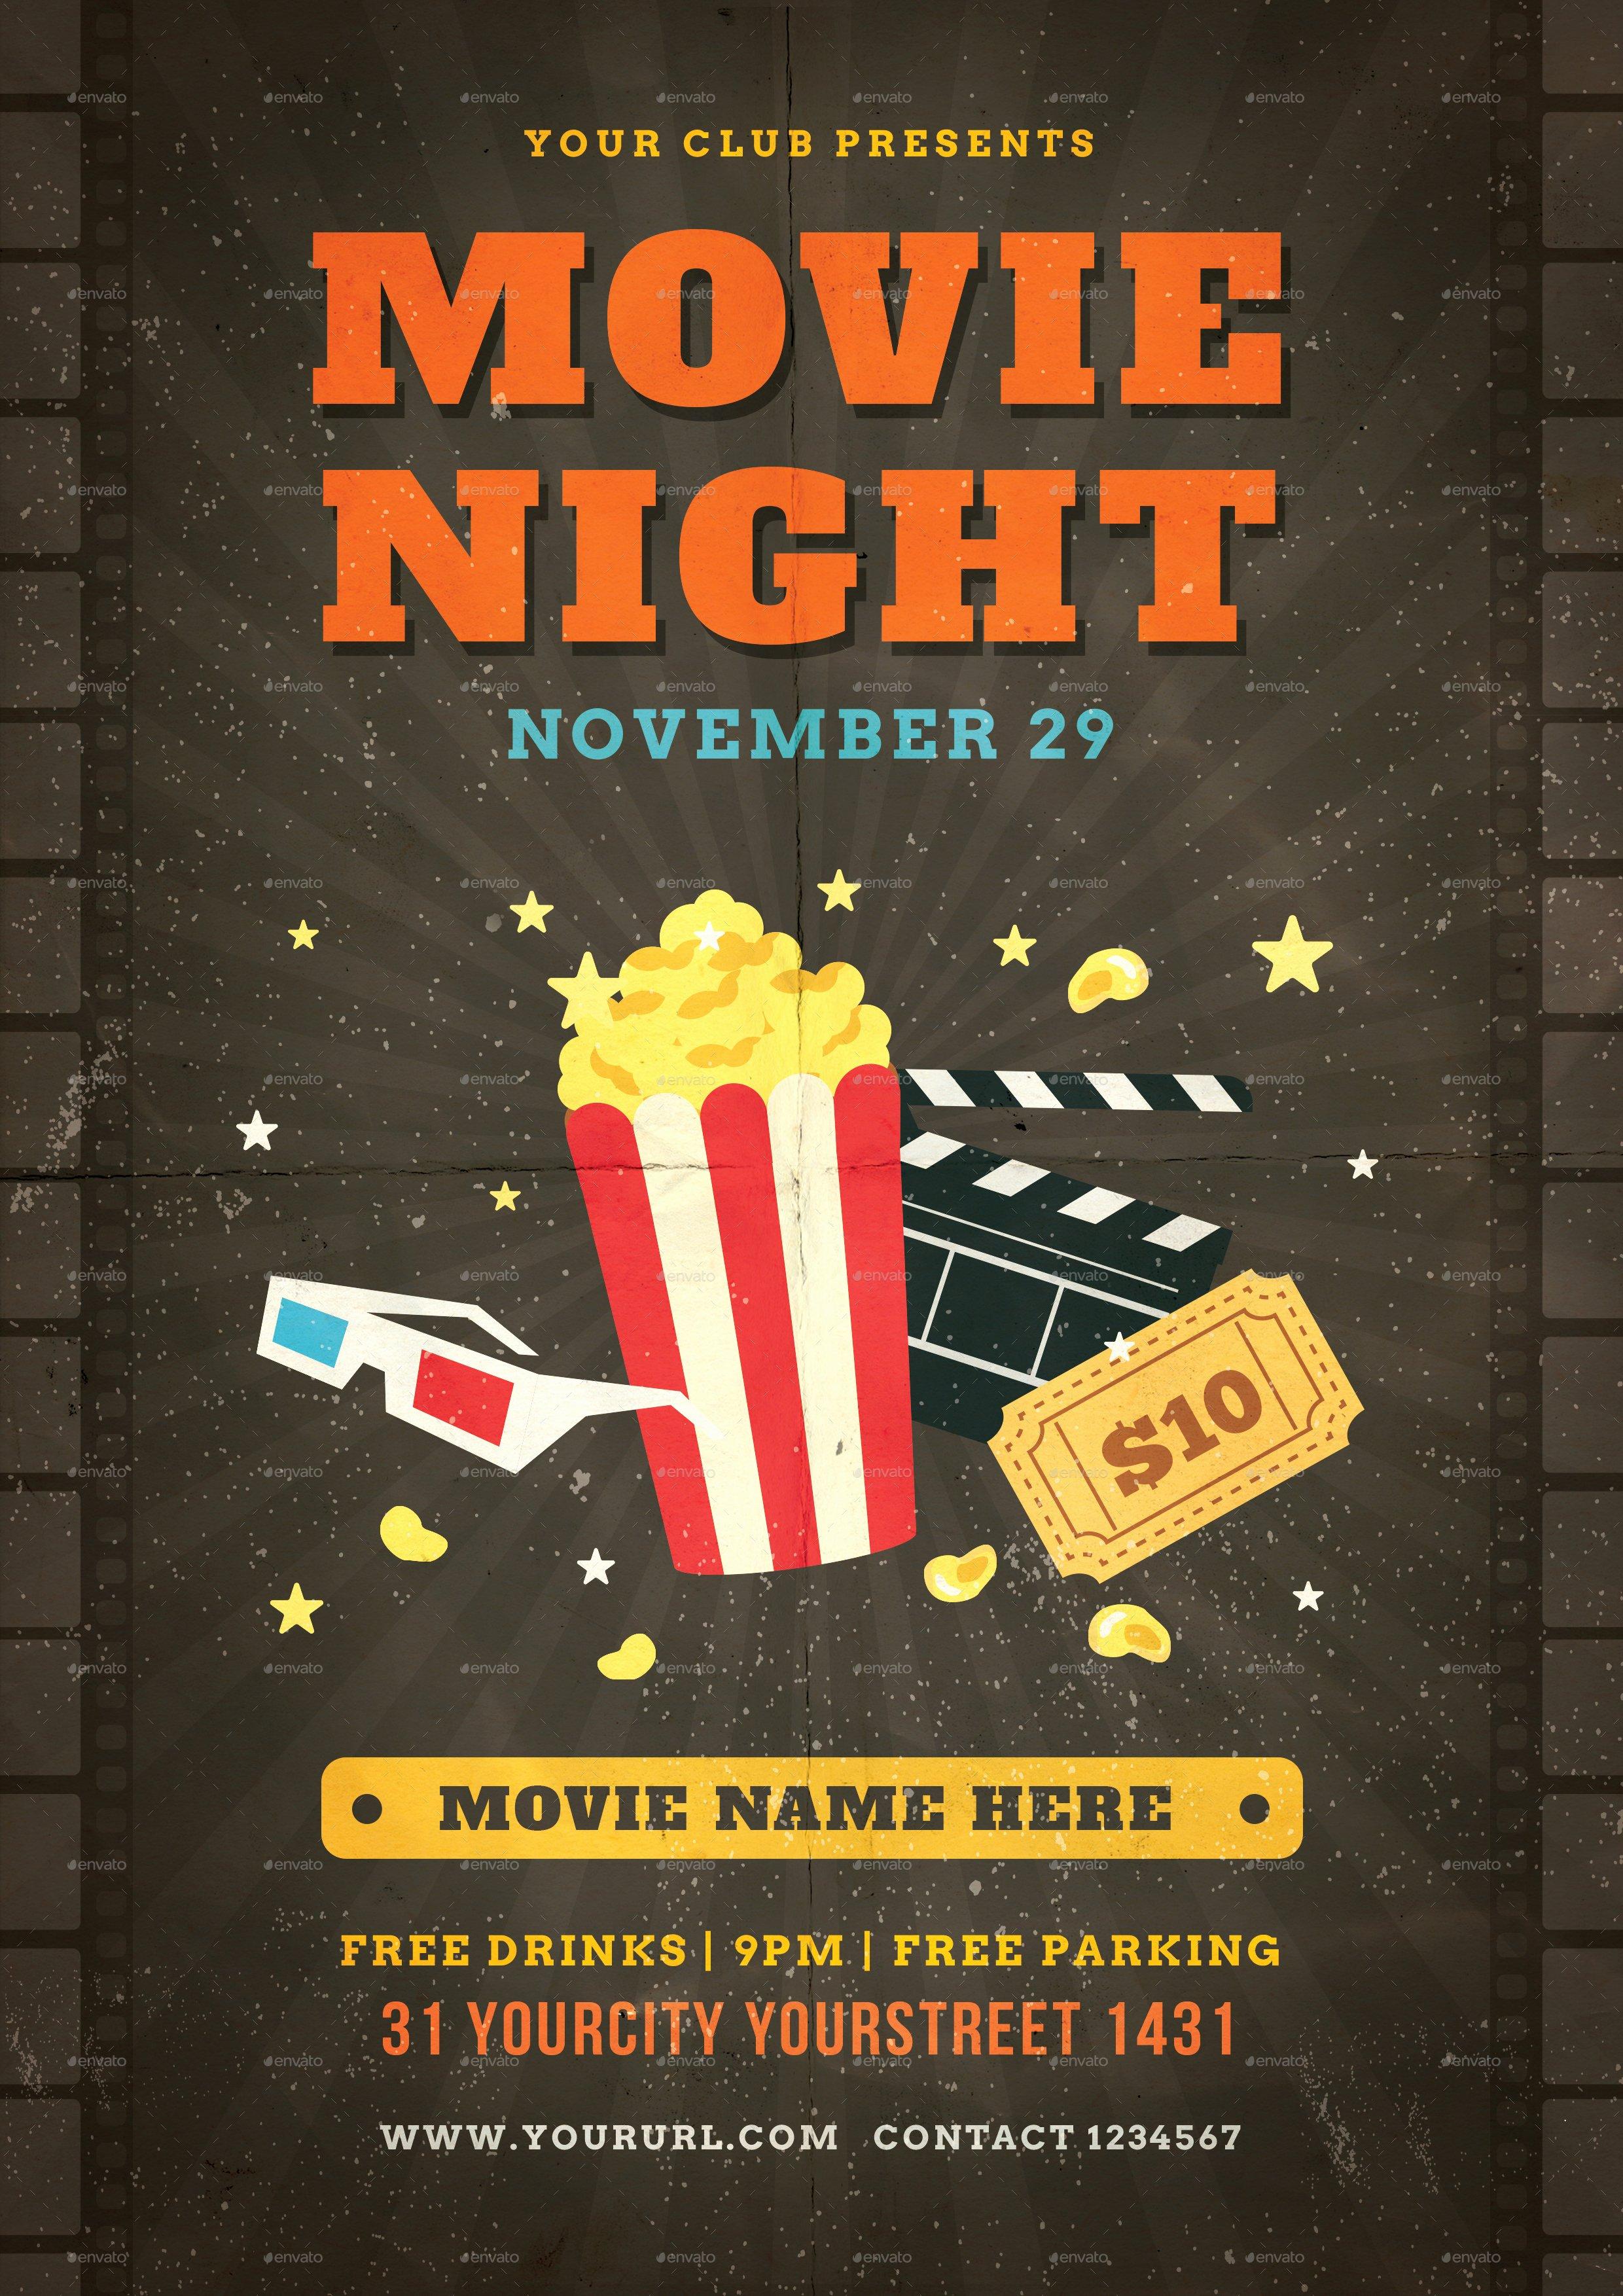 Movie Night Flyer Templates Inspirational Movie Night Flyer by Infinite